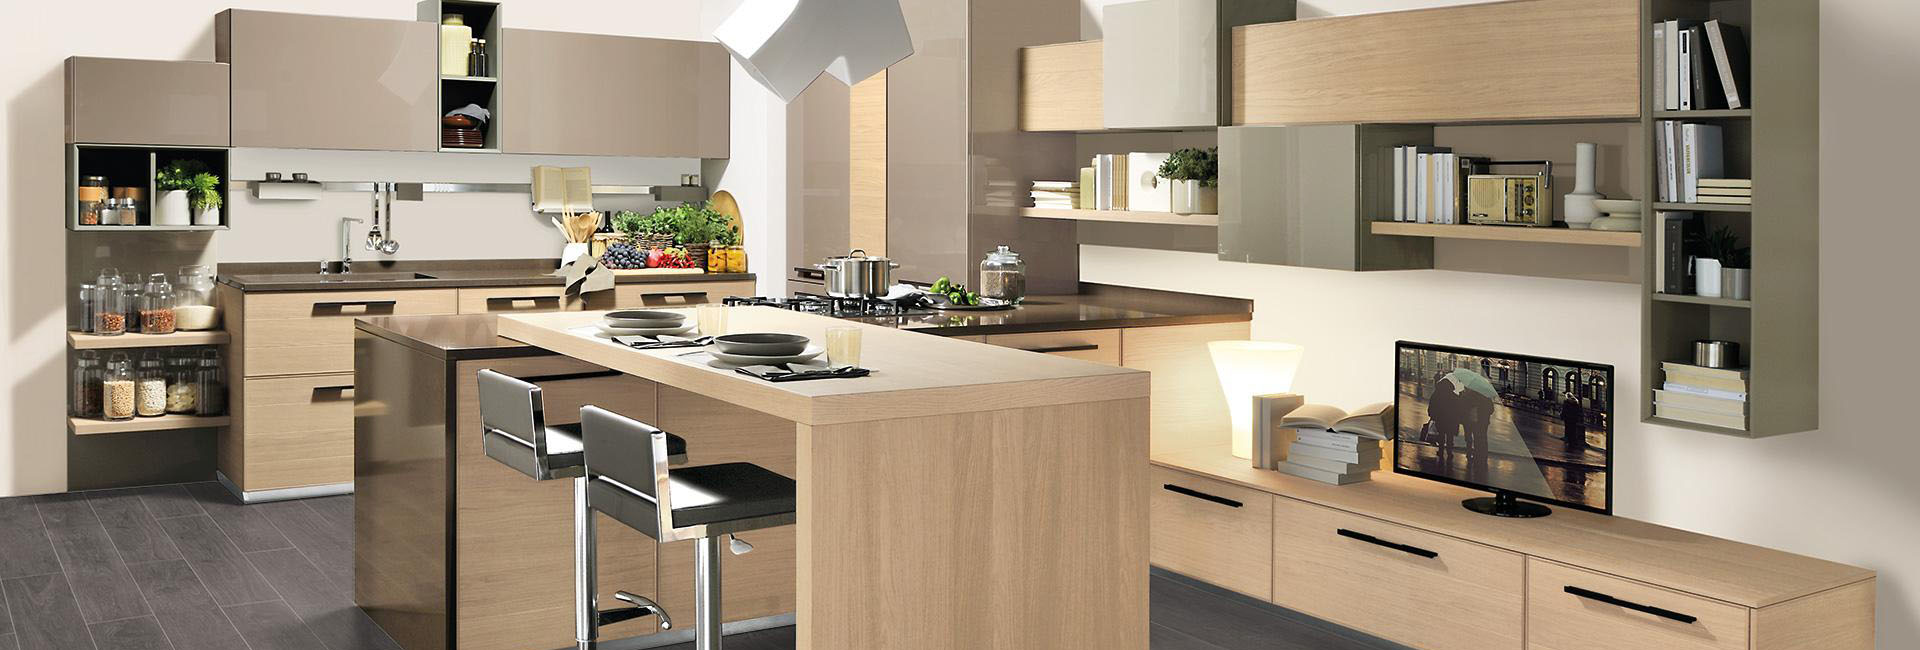 Cucine Moderne Lombardia.Cucine Su Misura Ghezzi Cucine